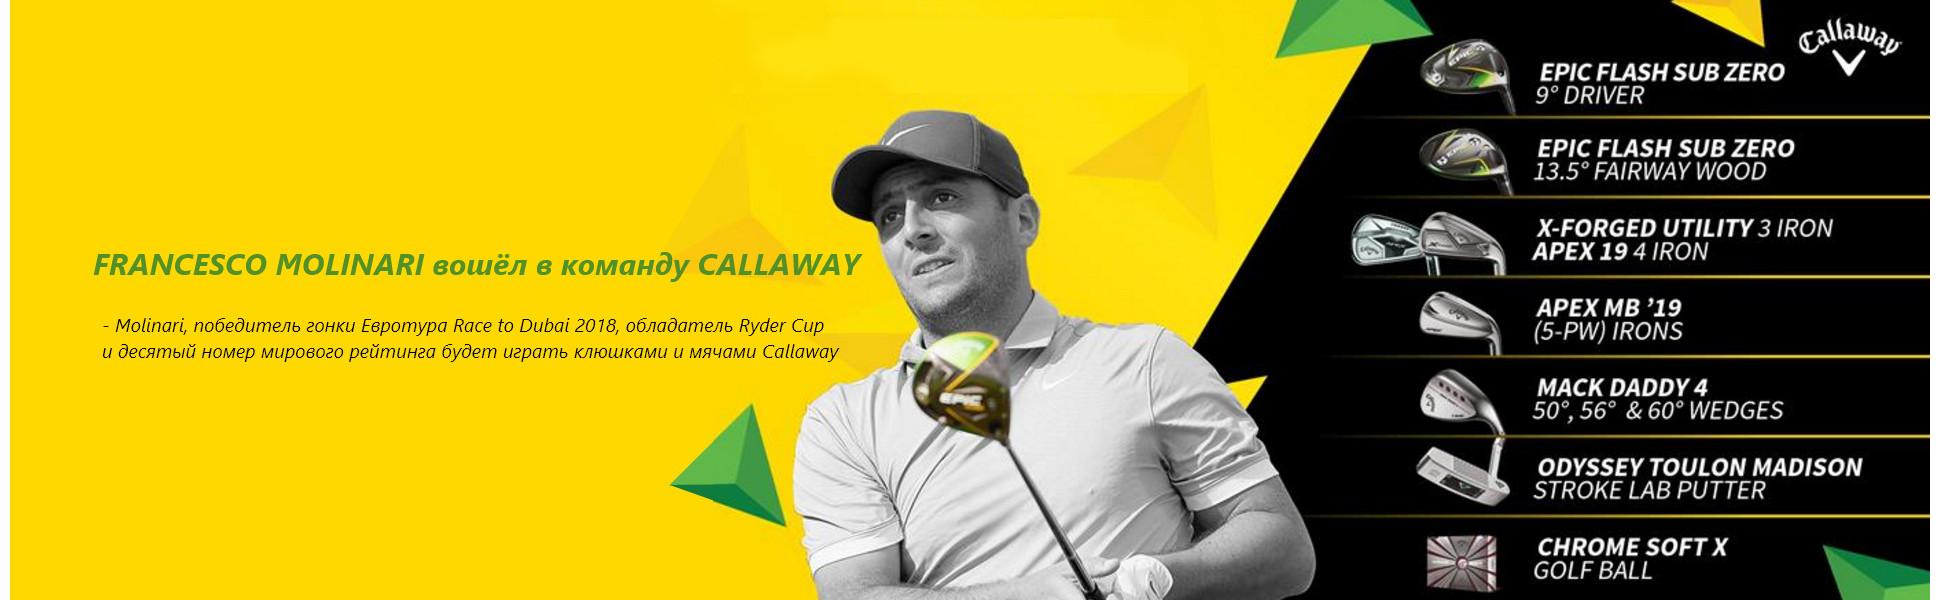 FRANCESCO MOLINARI вошёл в команду CALLAWAY